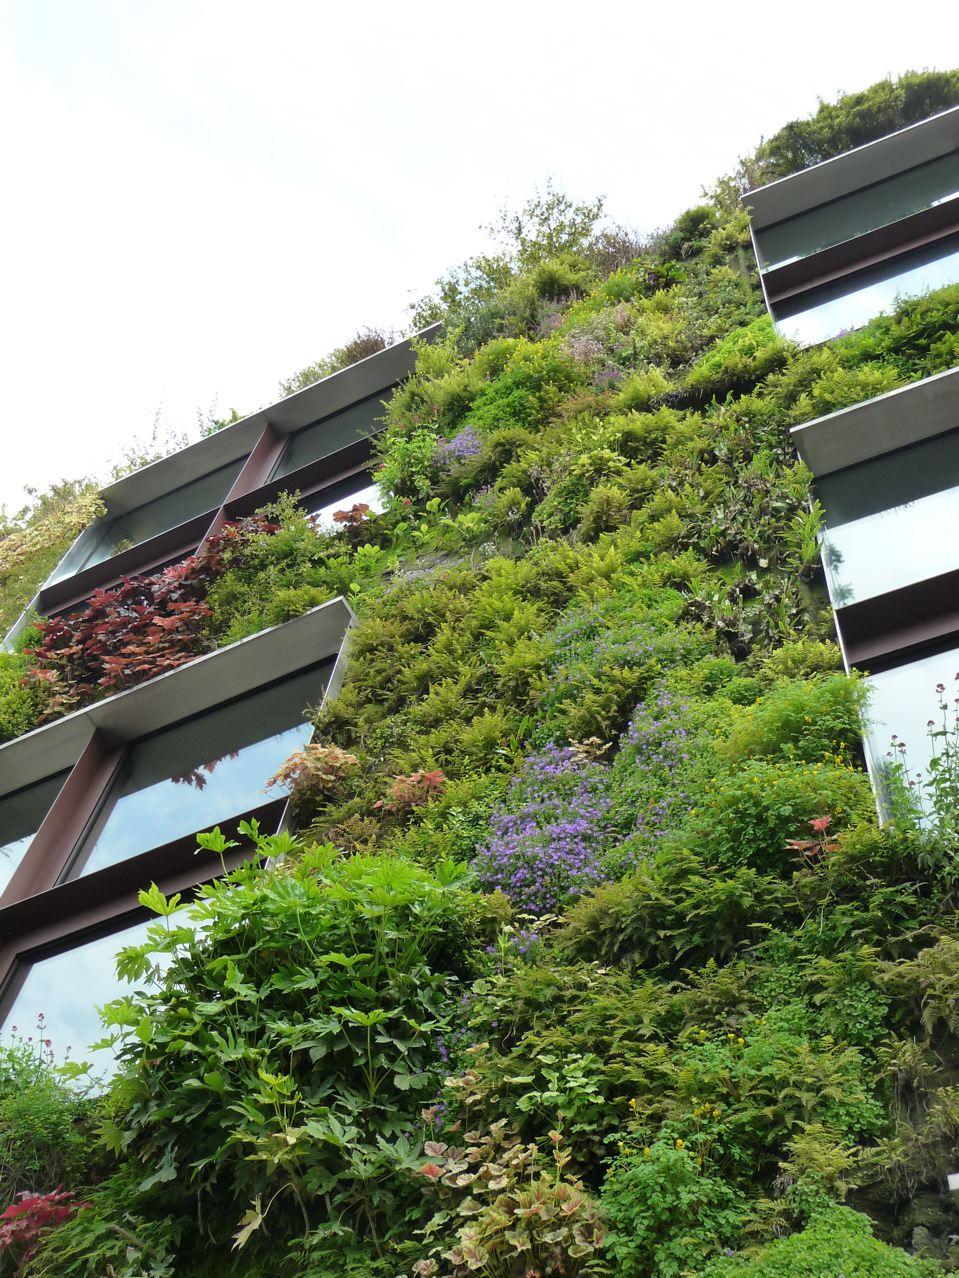 Jardin suspendu au printemps dans Paris